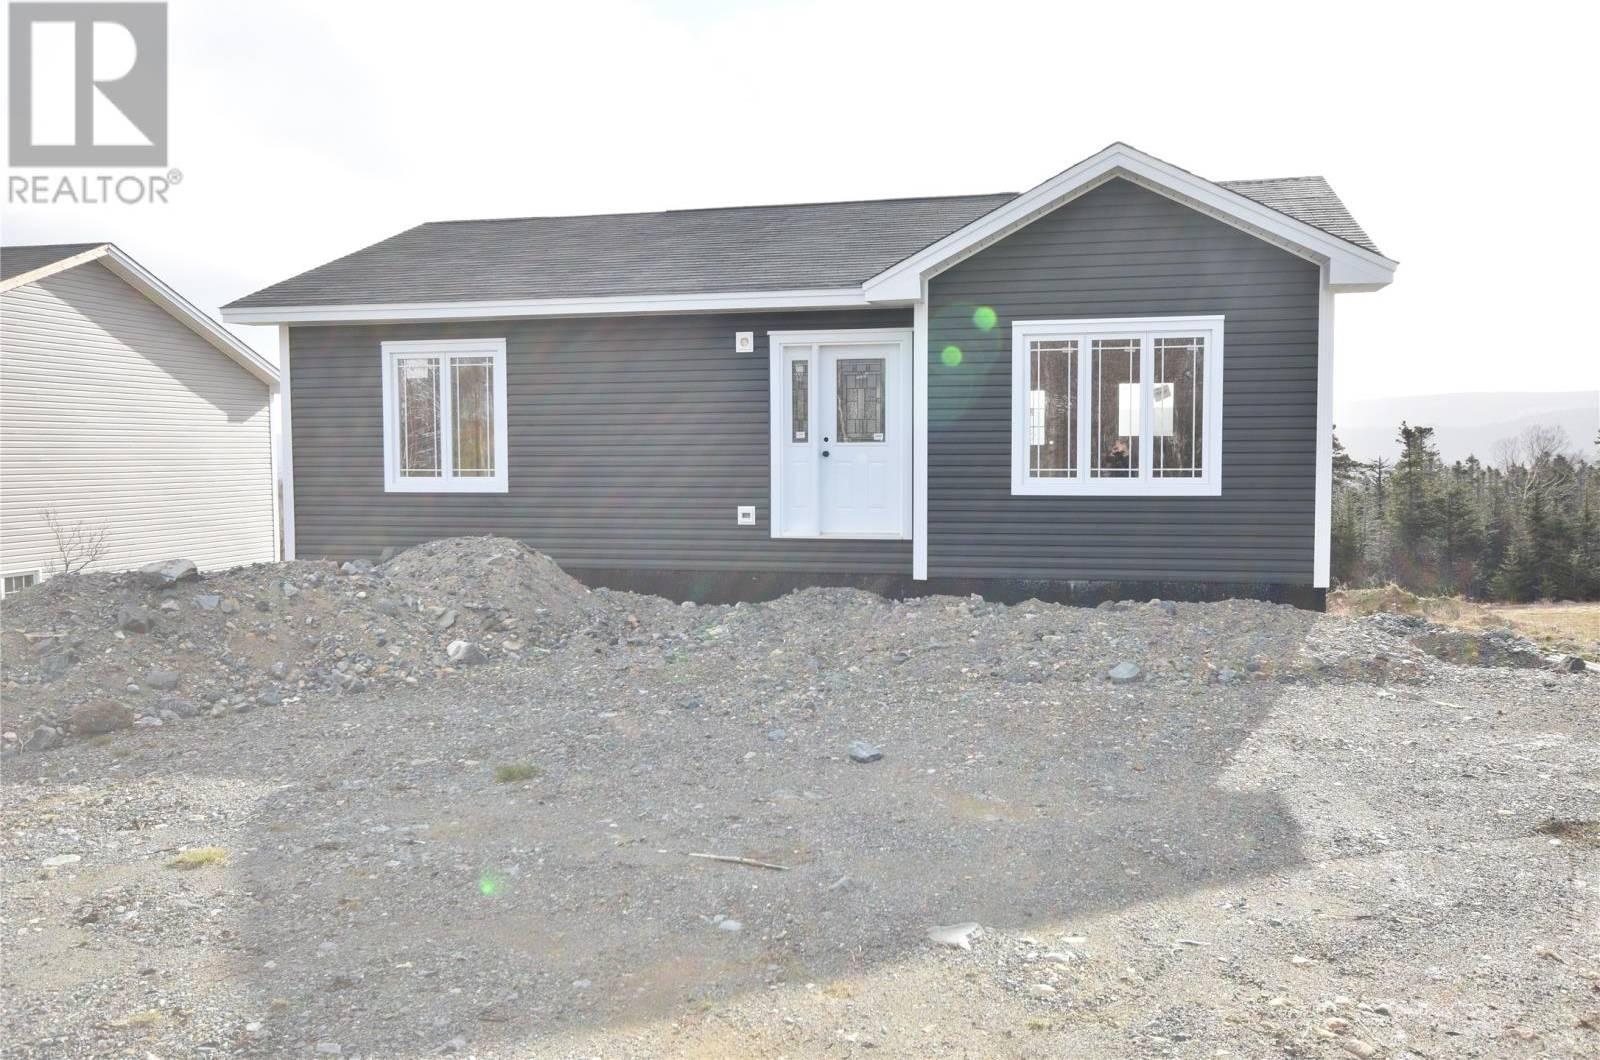 House for sale at 31 Farmland Ln Conception Bay South Newfoundland - MLS: 1209162